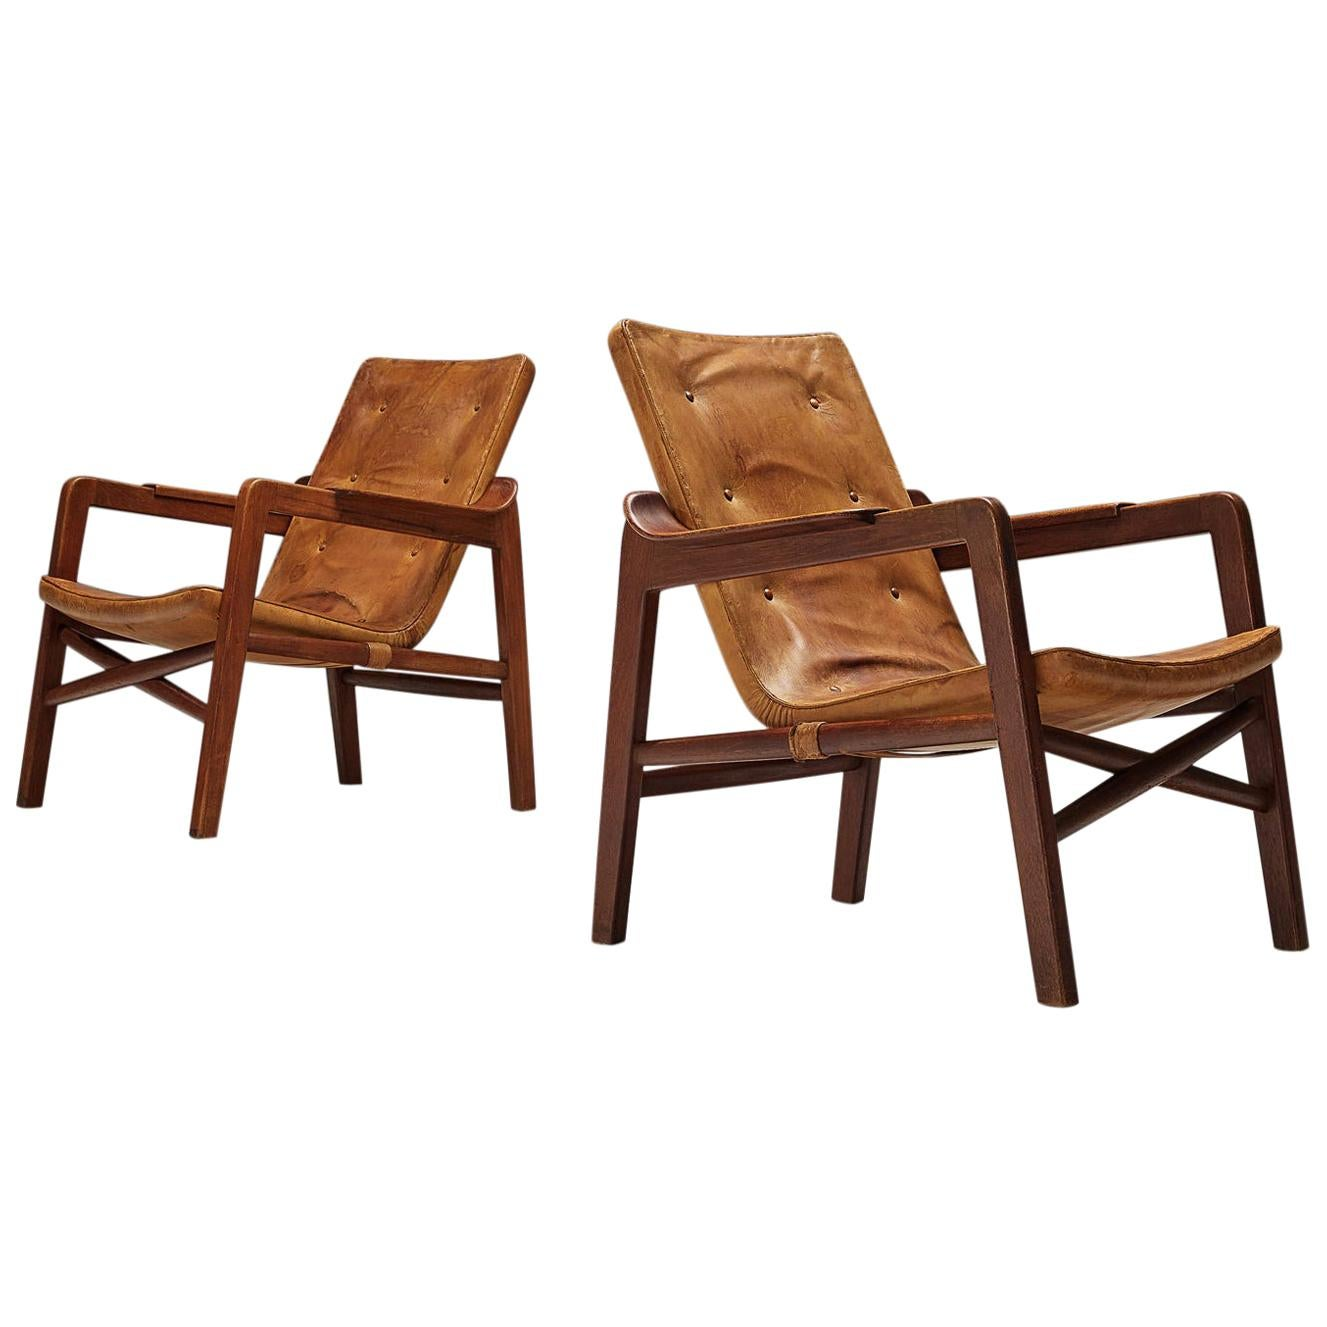 "Tove & Edvard Kindt-Larsen ""Fireside"" Armchairs in Original Leather"